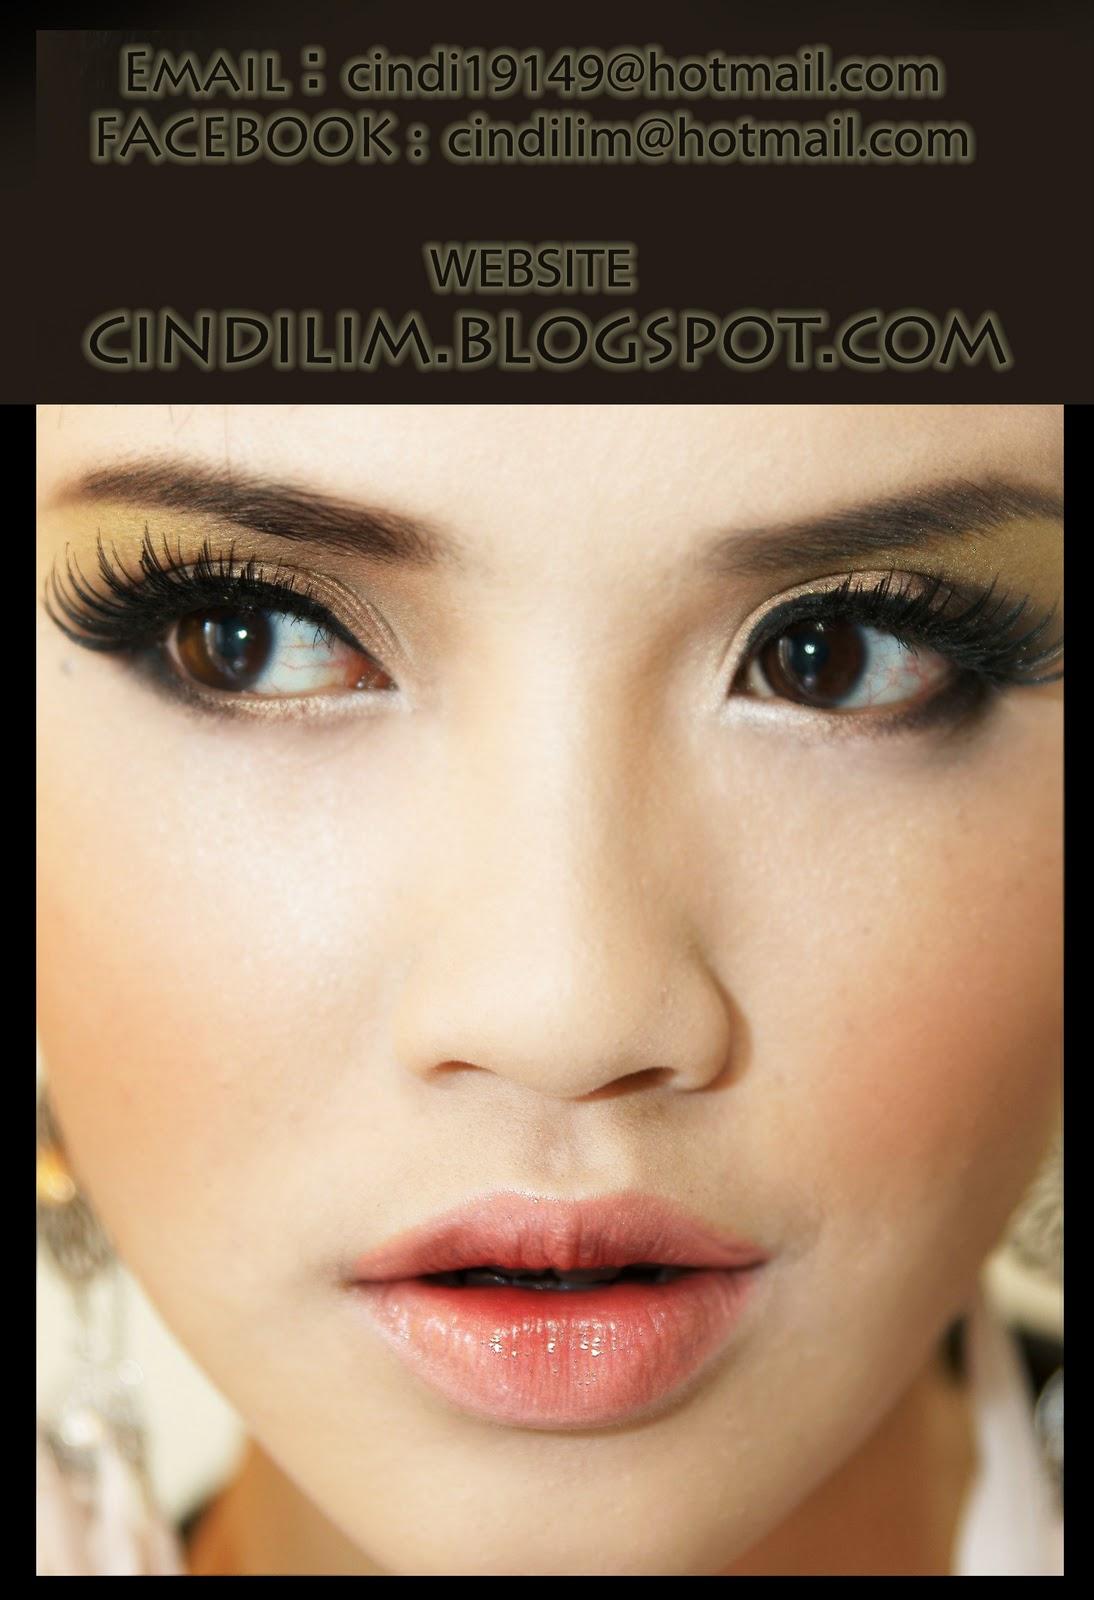 Cindi Pro Makeup Artist Commercial Photoshoot Makeup: :: Cindi Pro. Makeup Artist ::: Commercial Shoot With Miss